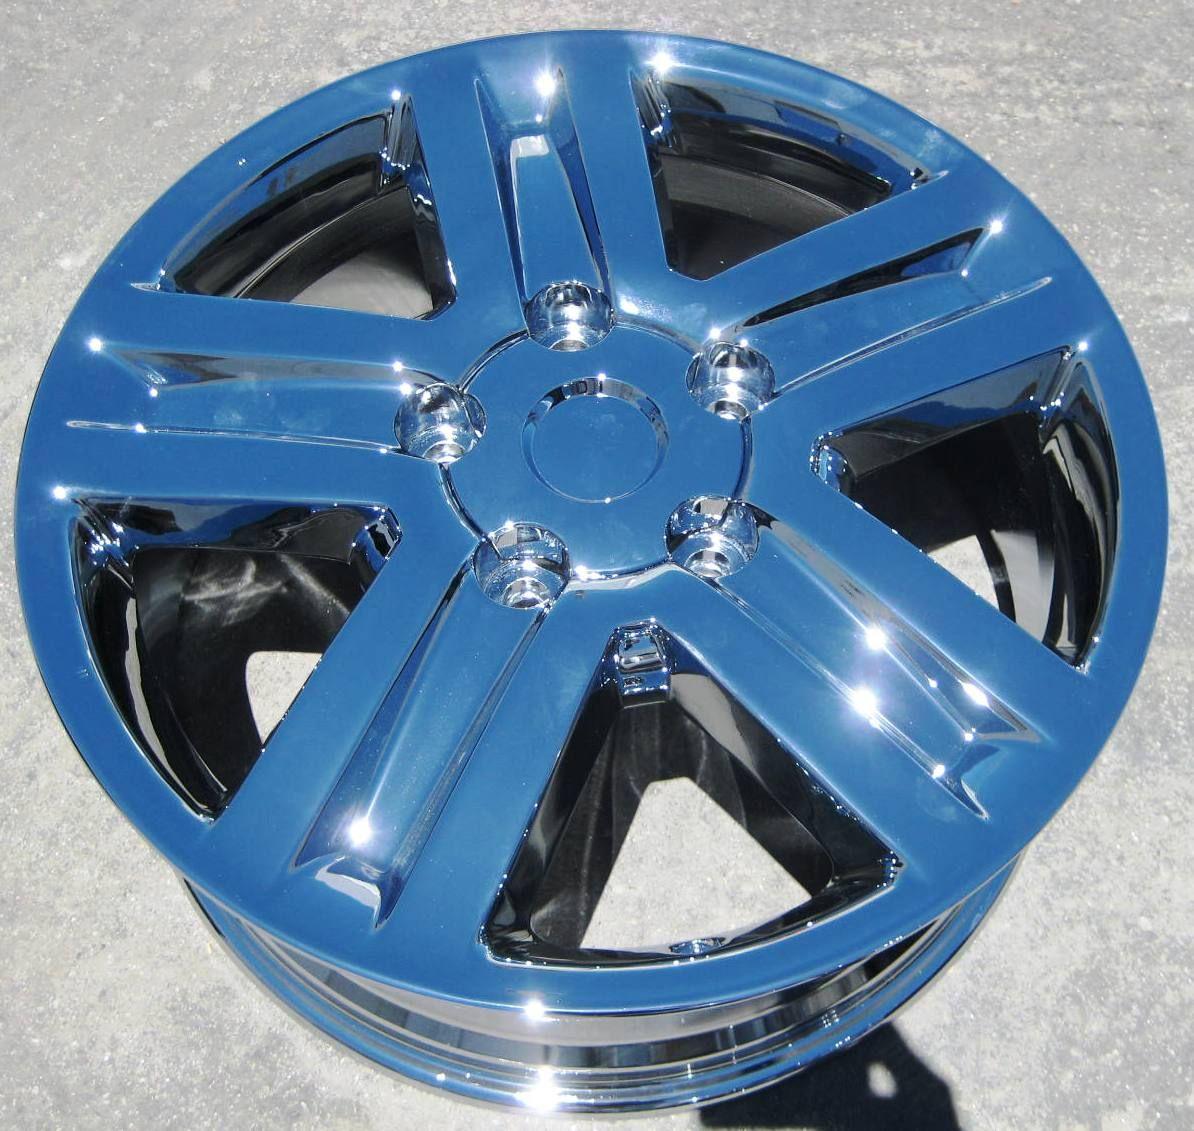 Factory Toyota Tundra Chrome Wheels Rims Sequoia LX570 Set of 4